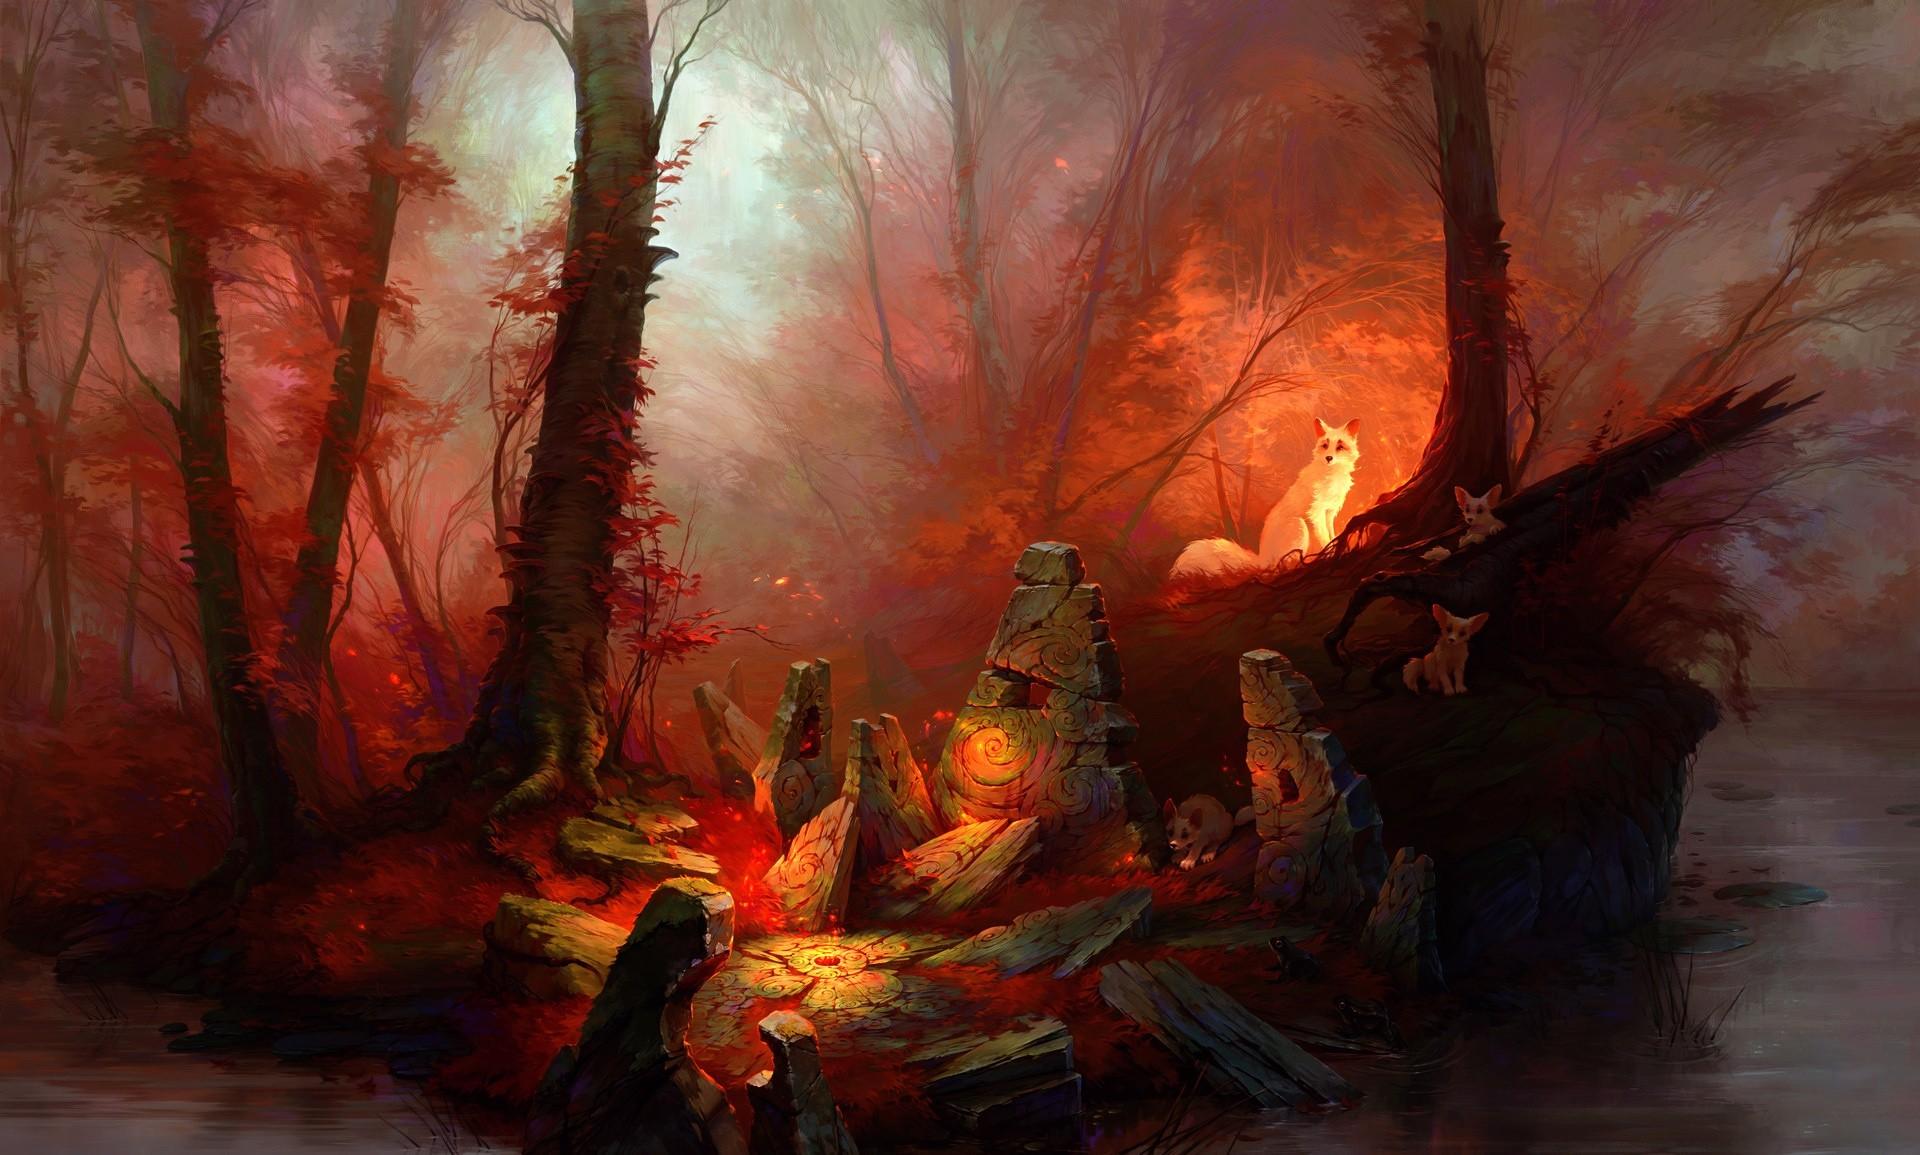 3d Wallpaper For Laptop Full Screen Red Forest Animals Fantasy Art Artwork Wallpapers Hd